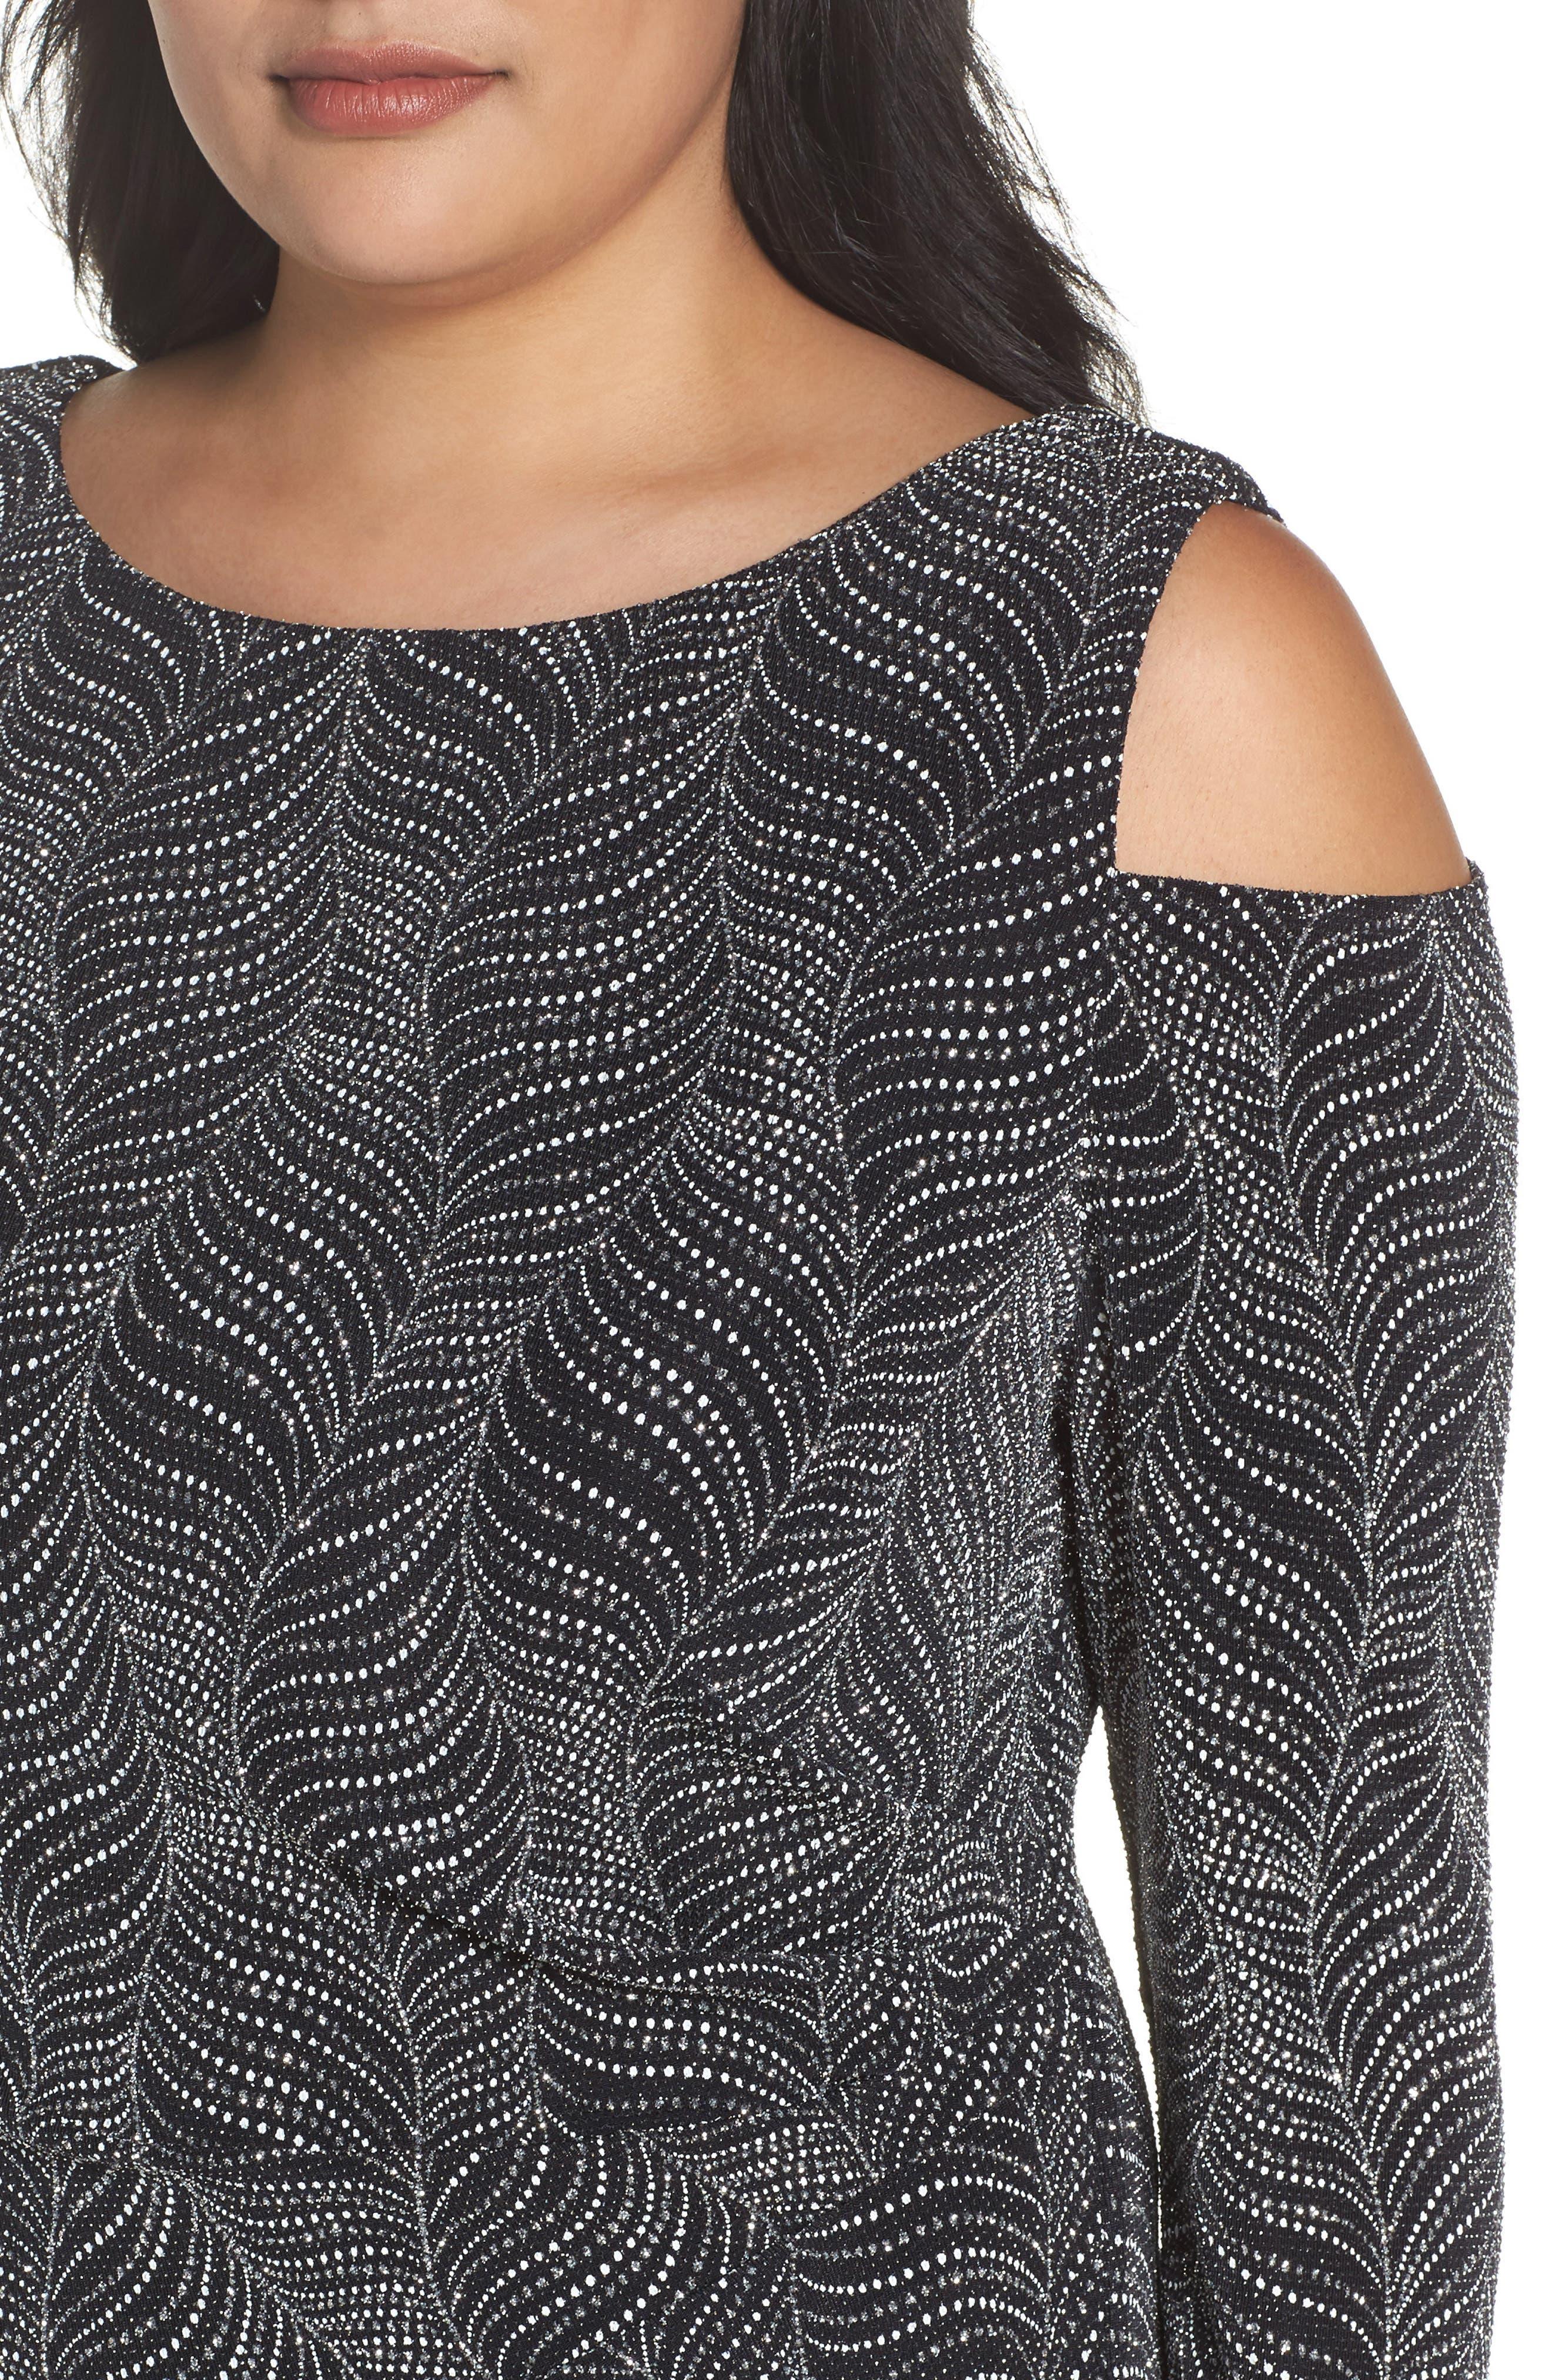 Cold Shoulder Glitter Knit Sheath Dress,                             Alternate thumbnail 4, color,                             Black/ Silver